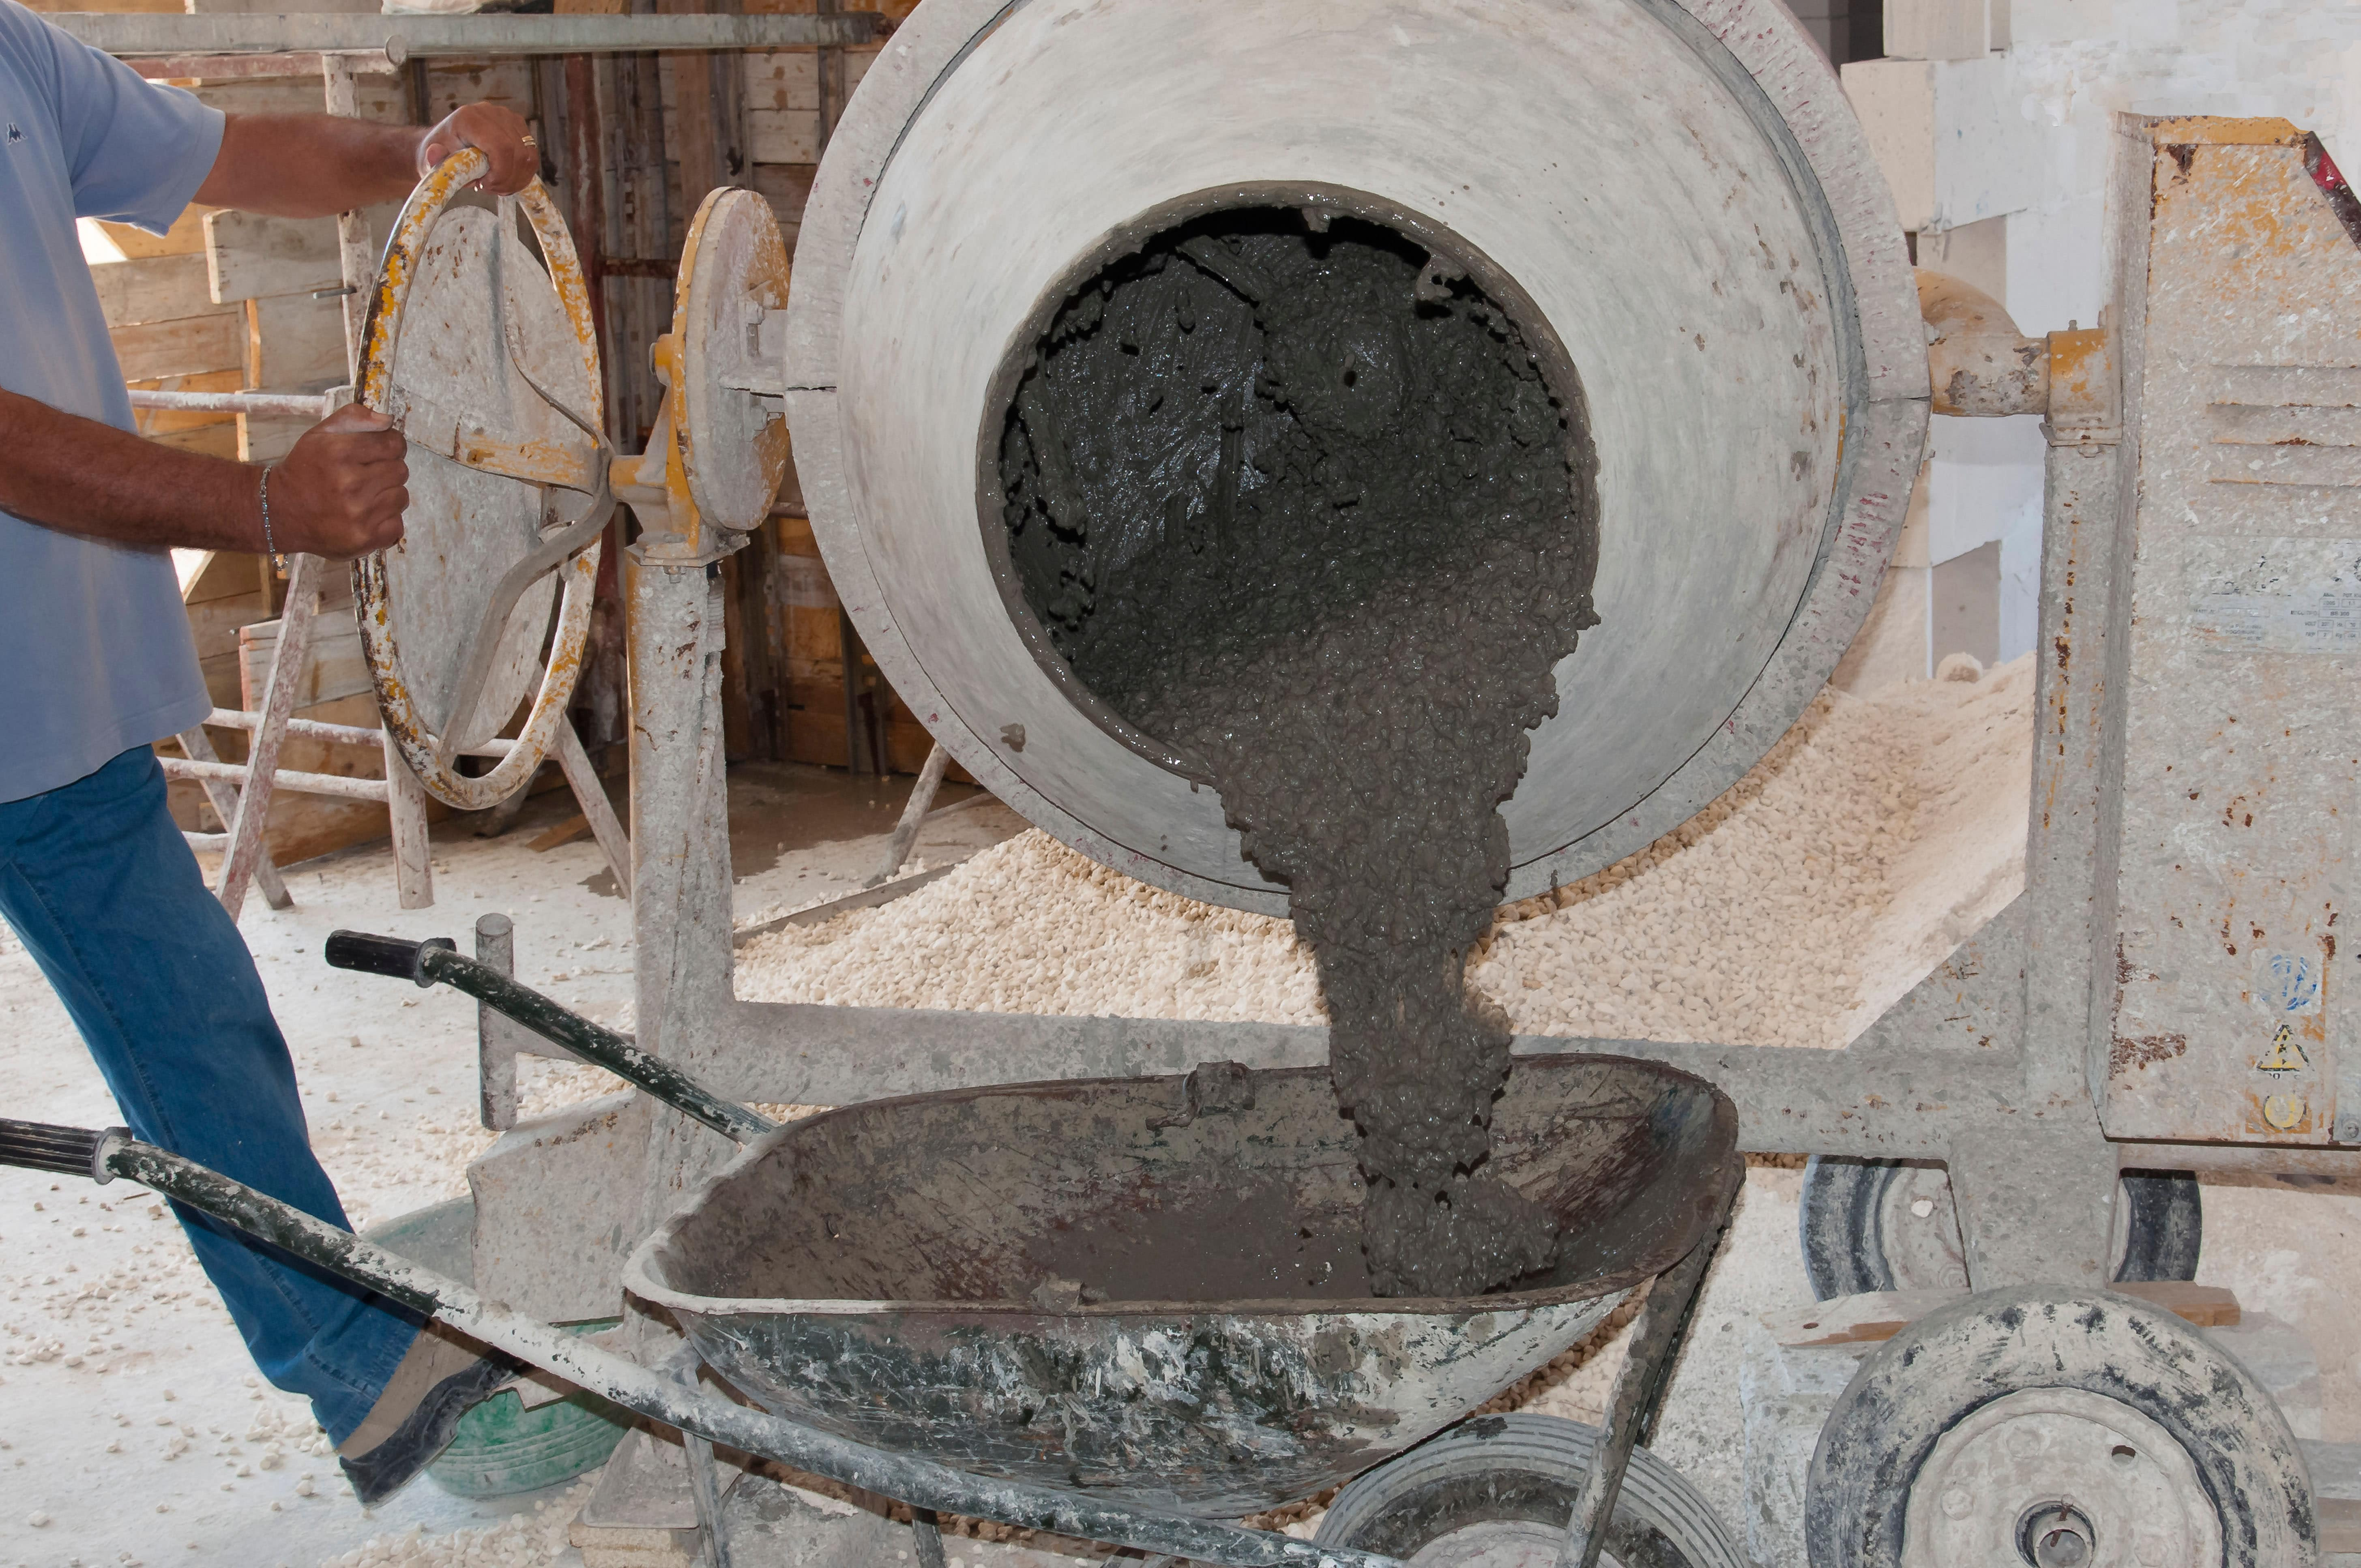 Cement mixer worst shot to drink